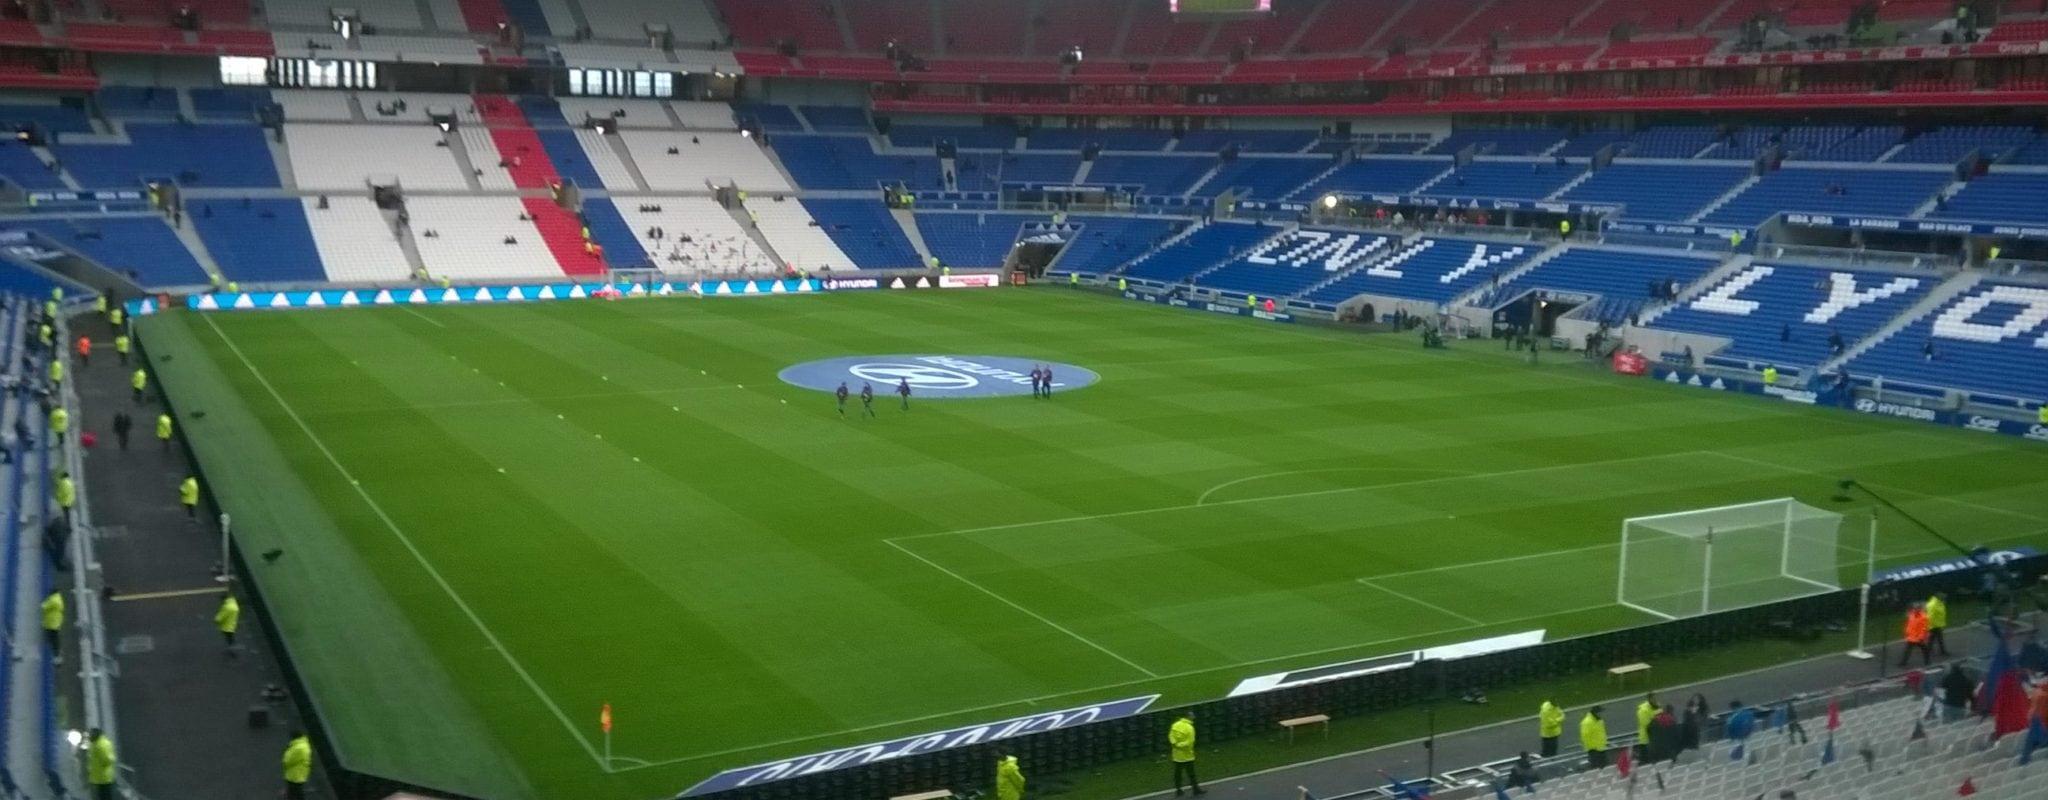 «Chasse aux supporters strasbourgeois» à Lyon : on fait le point